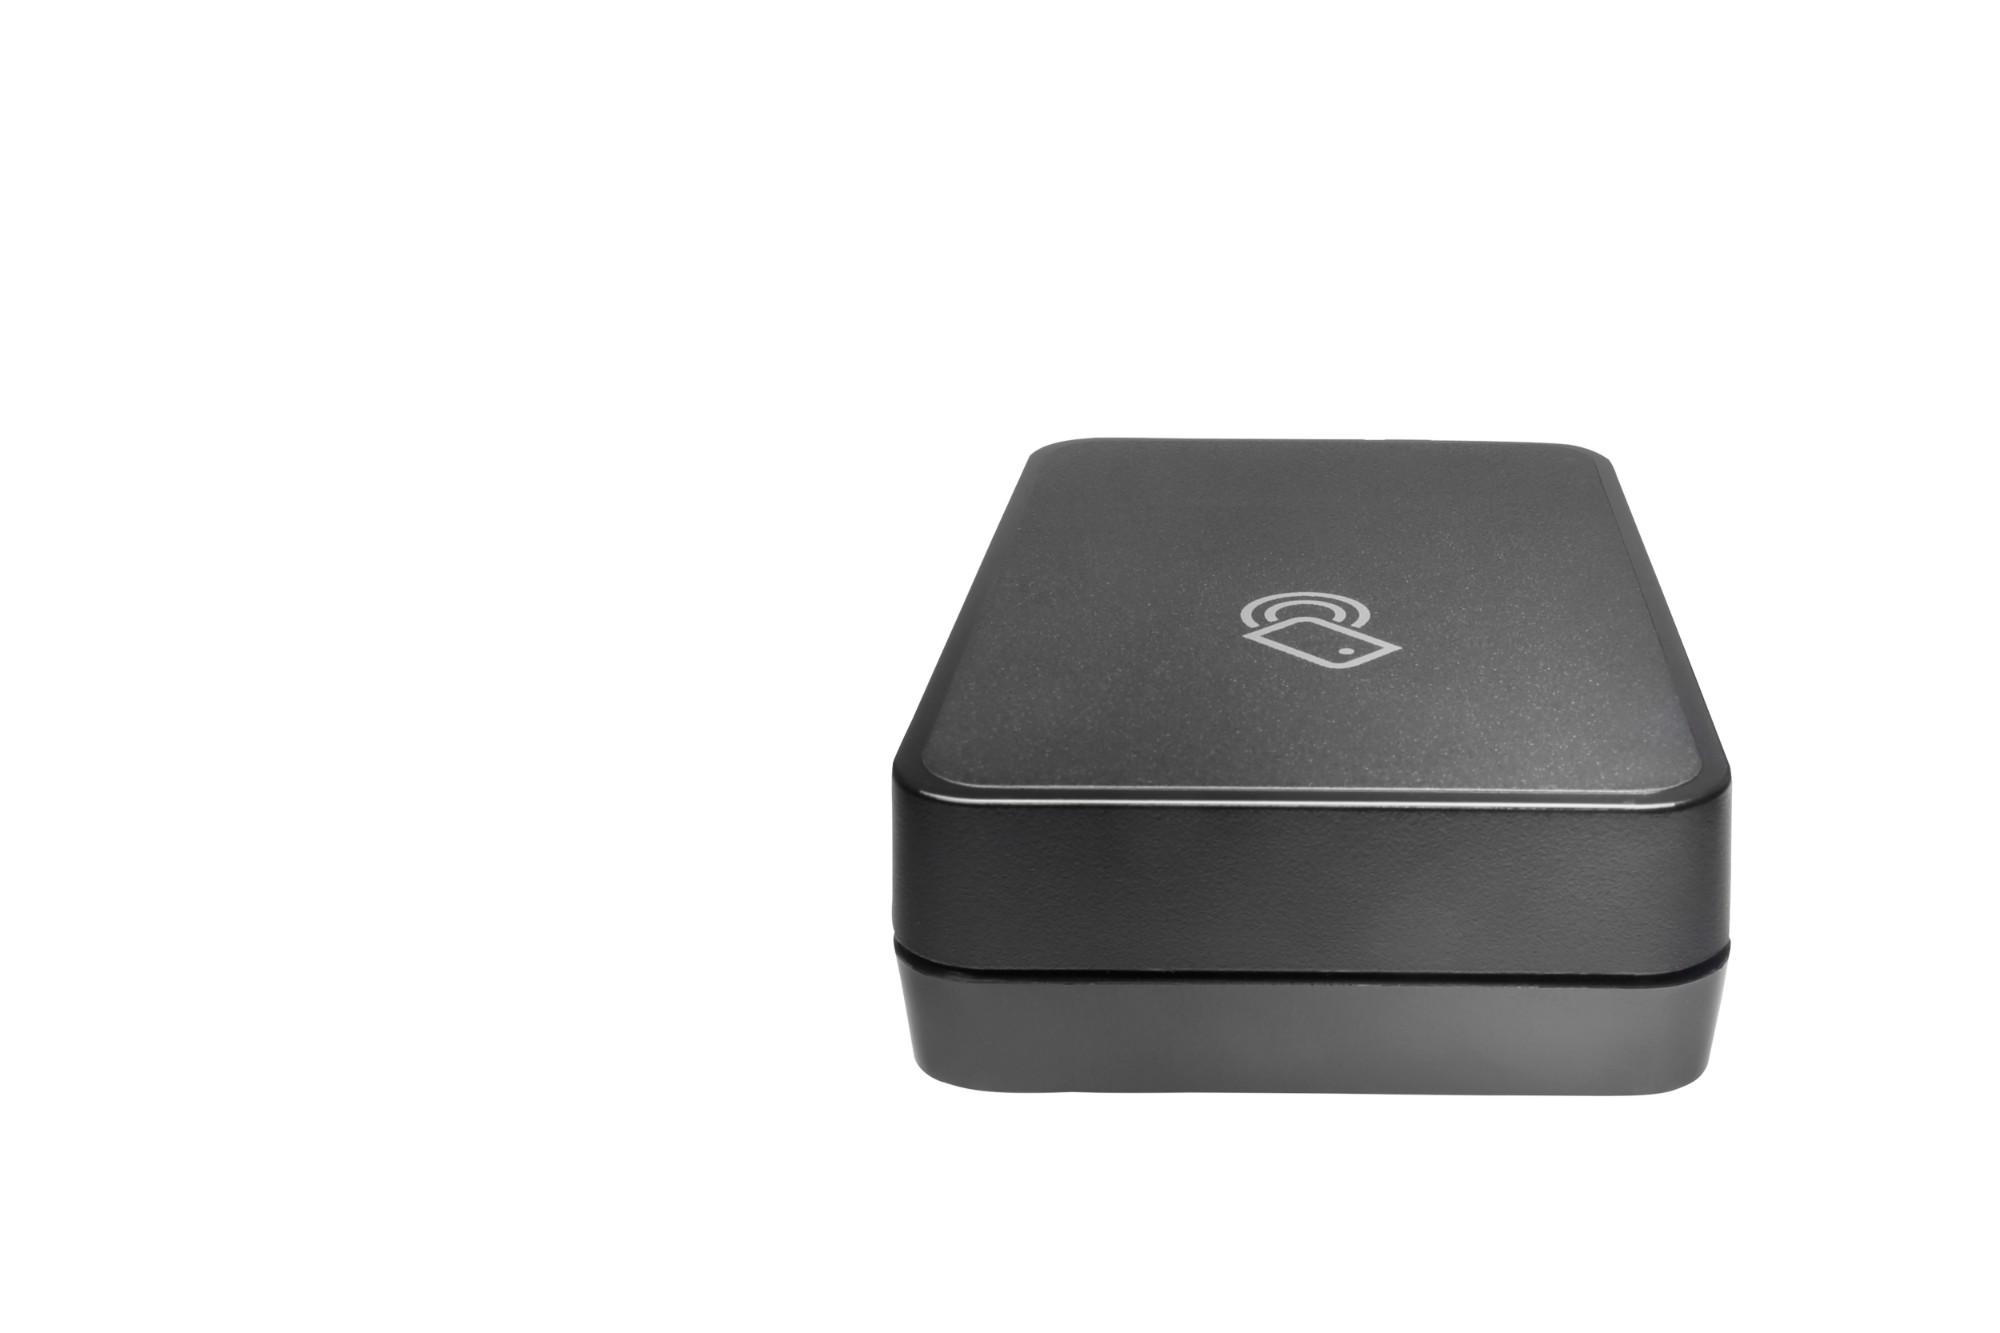 HP Jetdirect 3100w BLE/NFC/Wireless Accessory print server